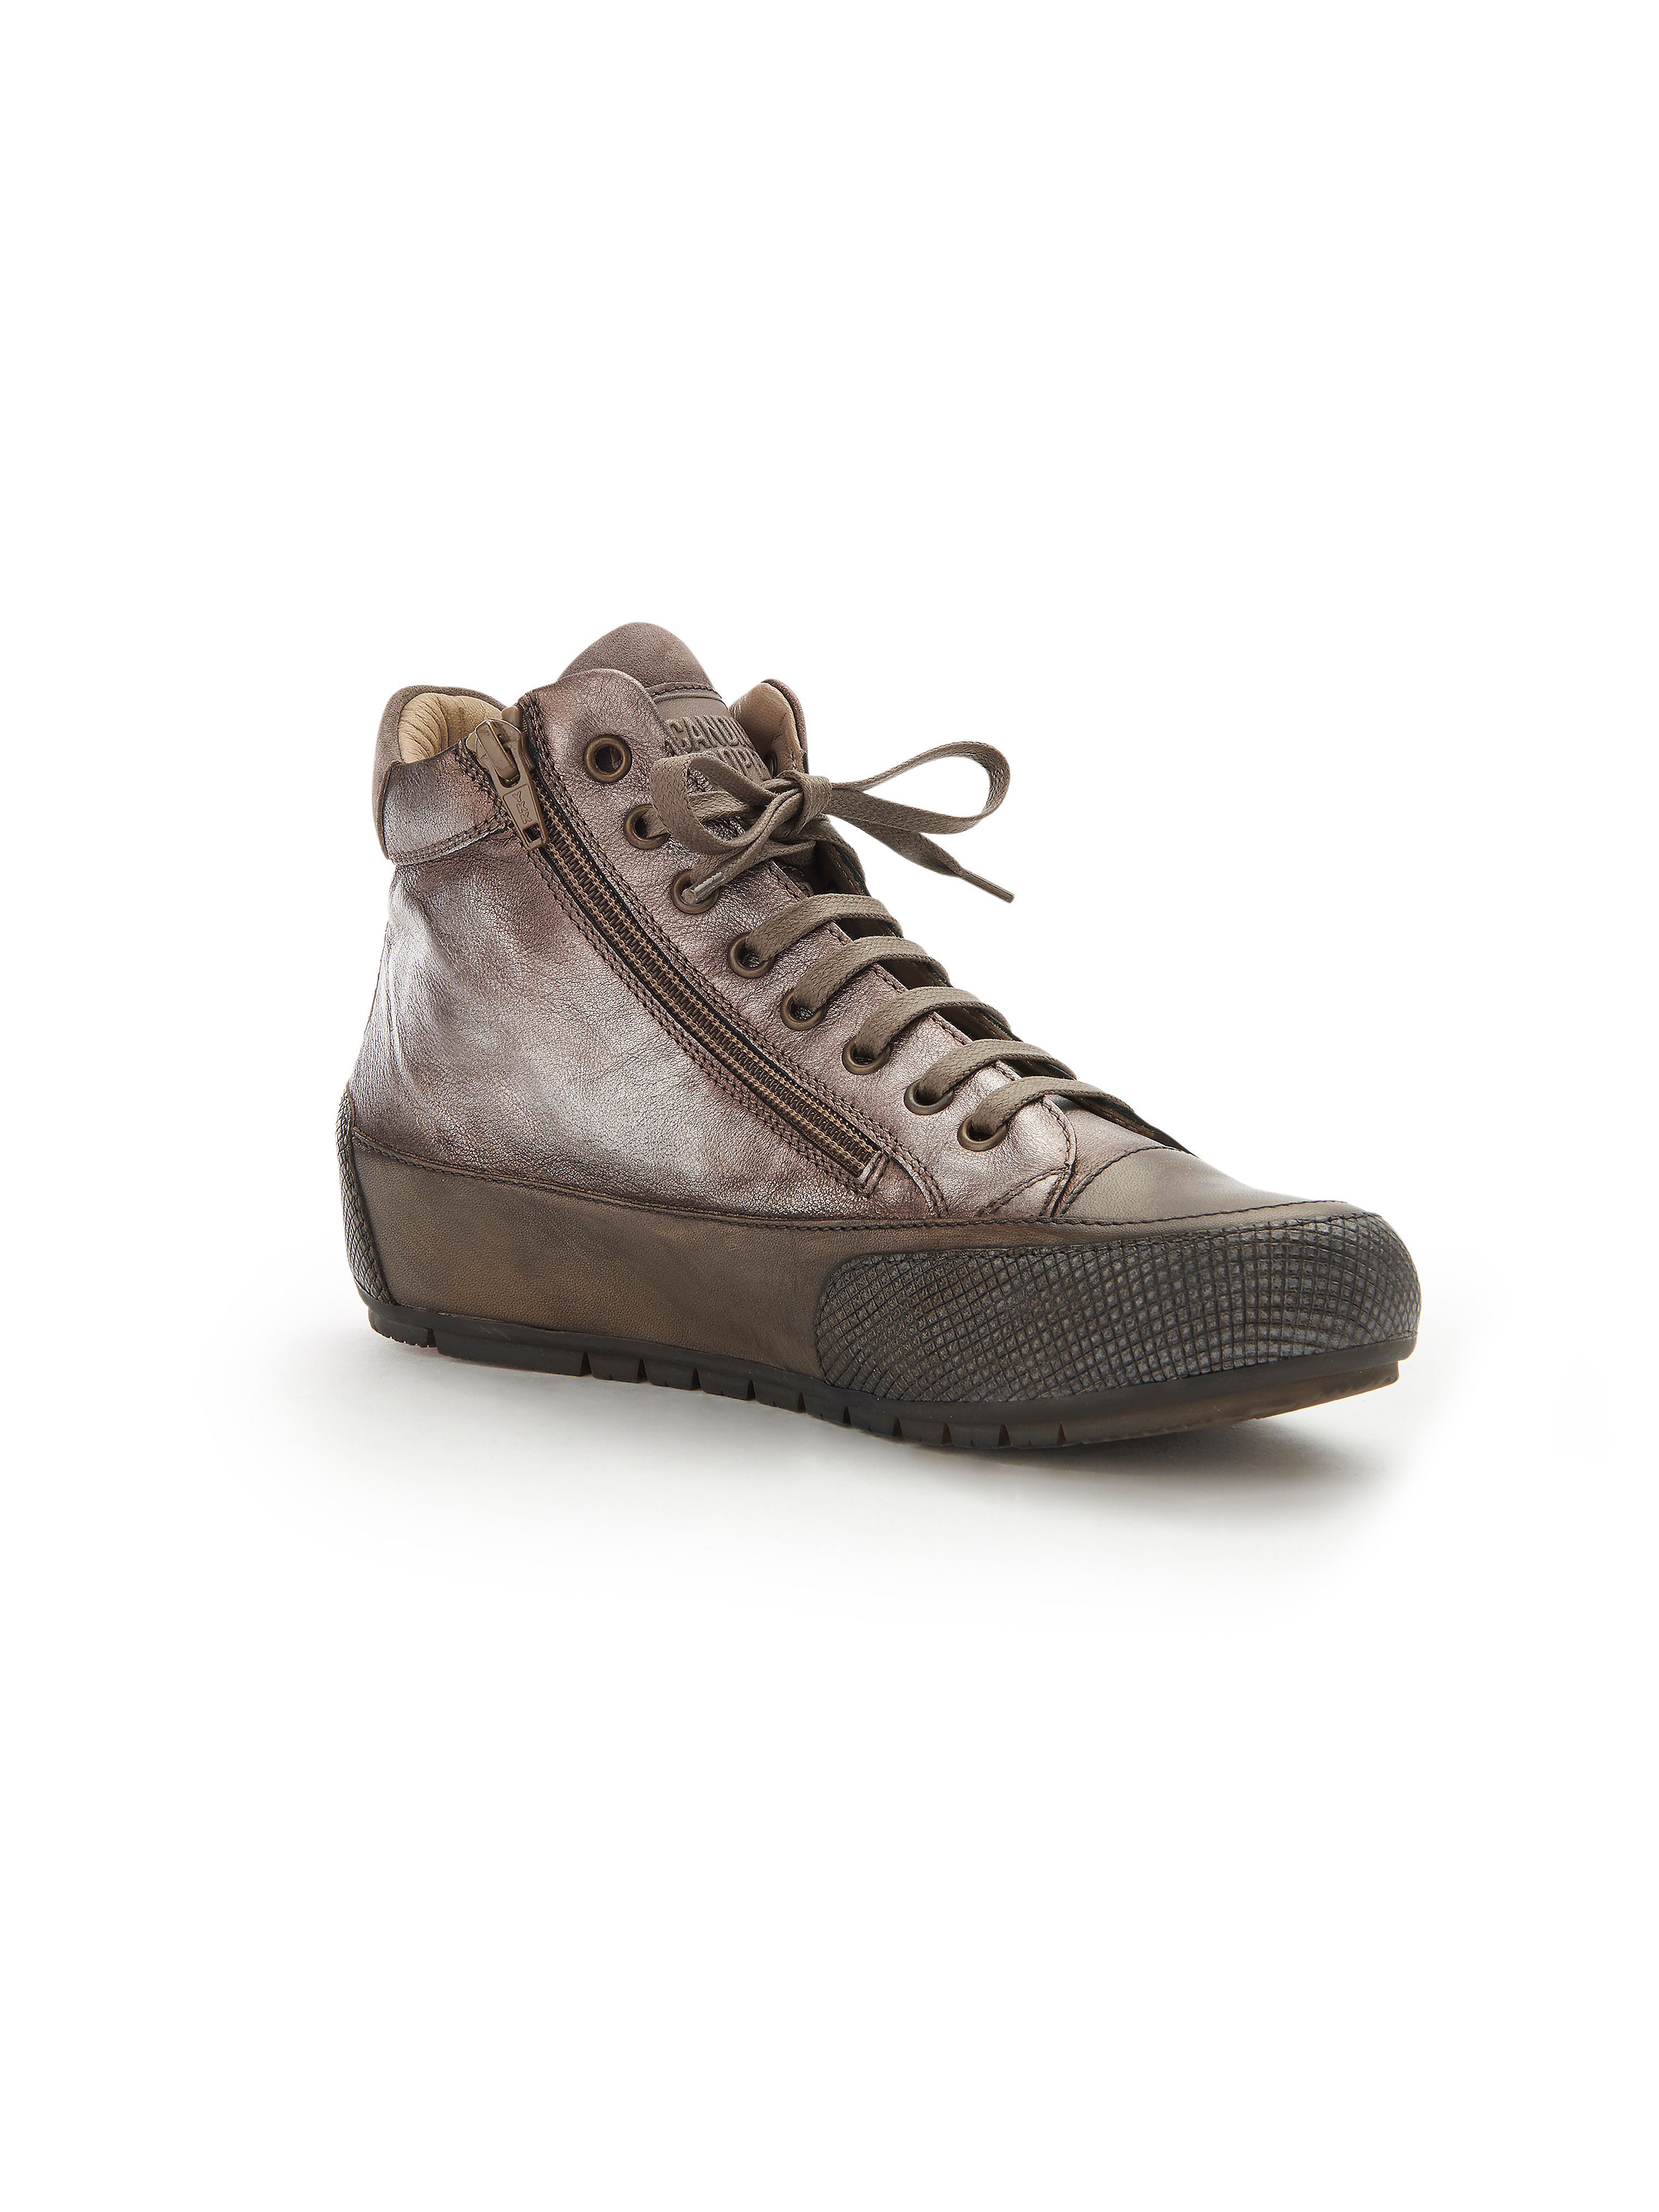 "Candice Cooper - Sneaker ""Plus Sport"" - Taupe-Metallic Gute Qualität beliebte Schuhe"